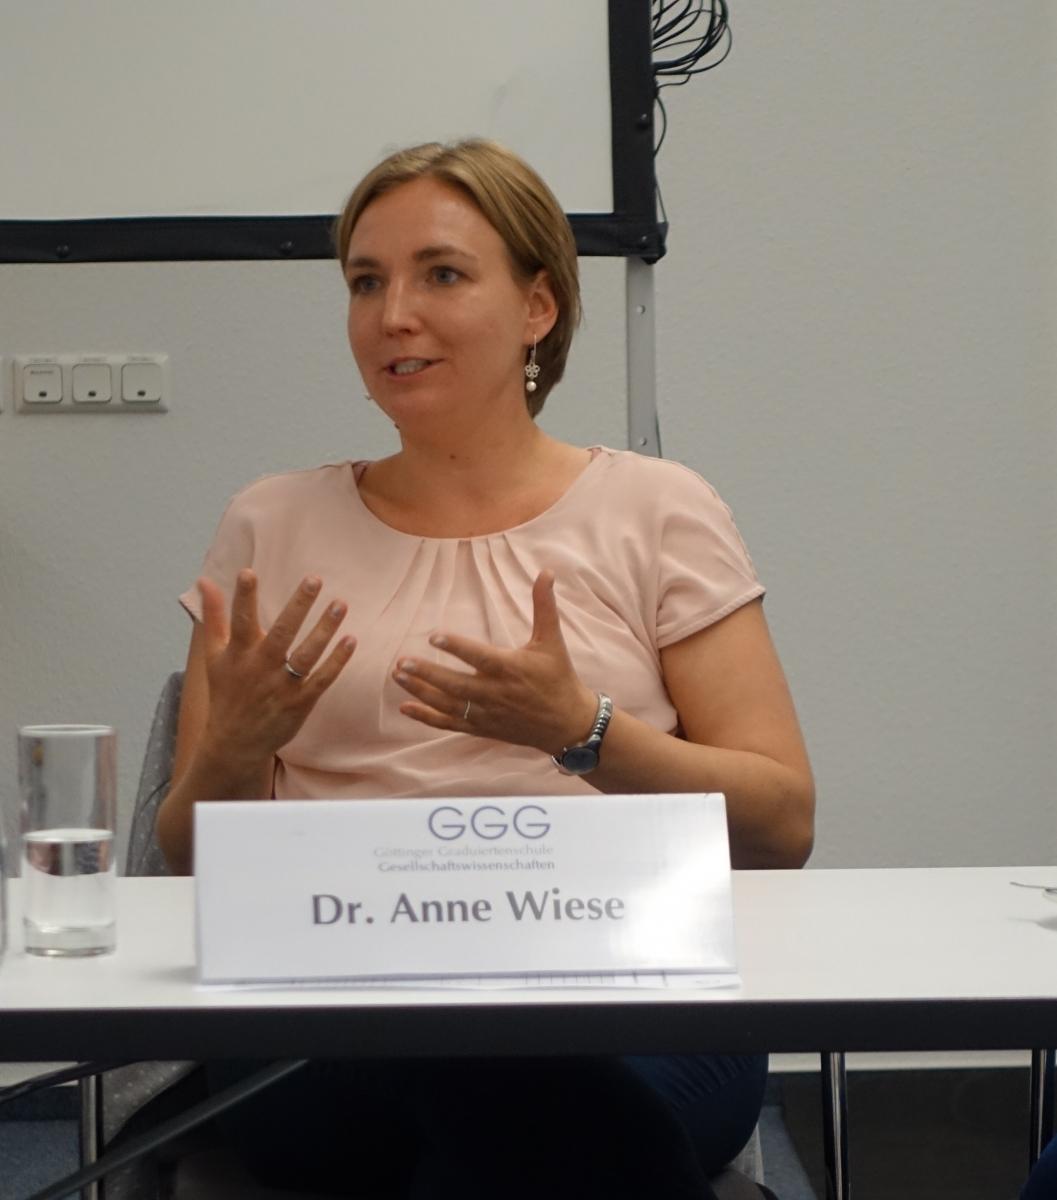 Anne Wiese